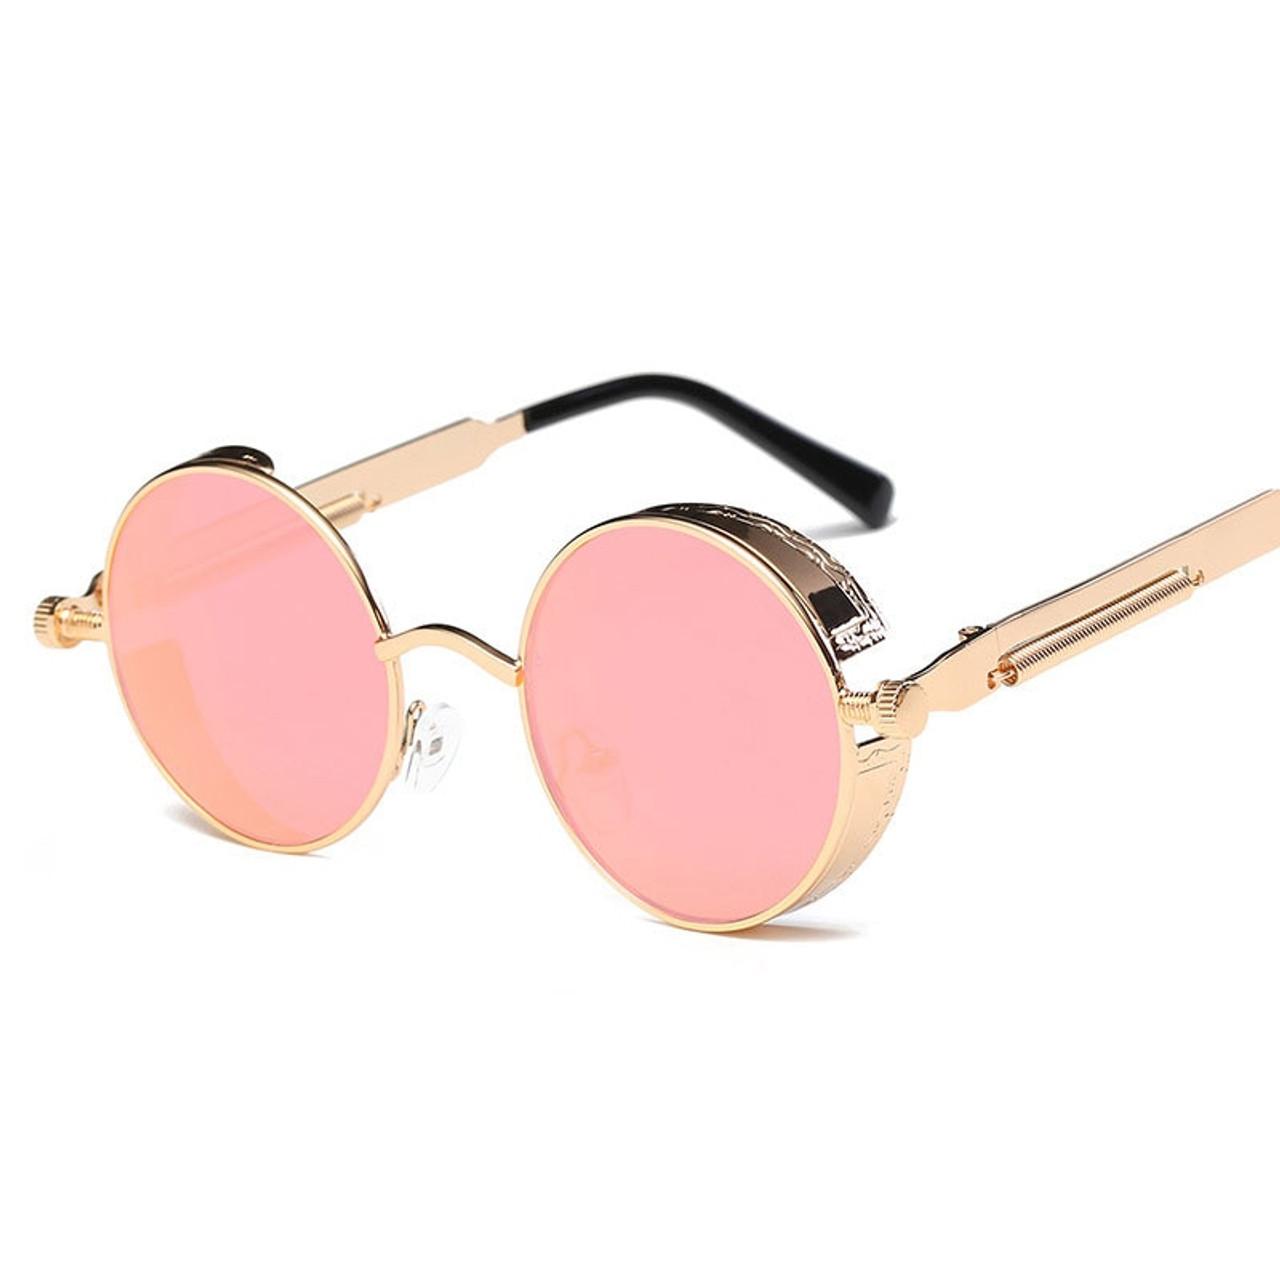 1a9ac2aa6aa ... Metal Round Steampunk Sunglasses Men Women Fashion Glasses Brand  Designer Retro Frame Vintage Sunglasses High Quality ...